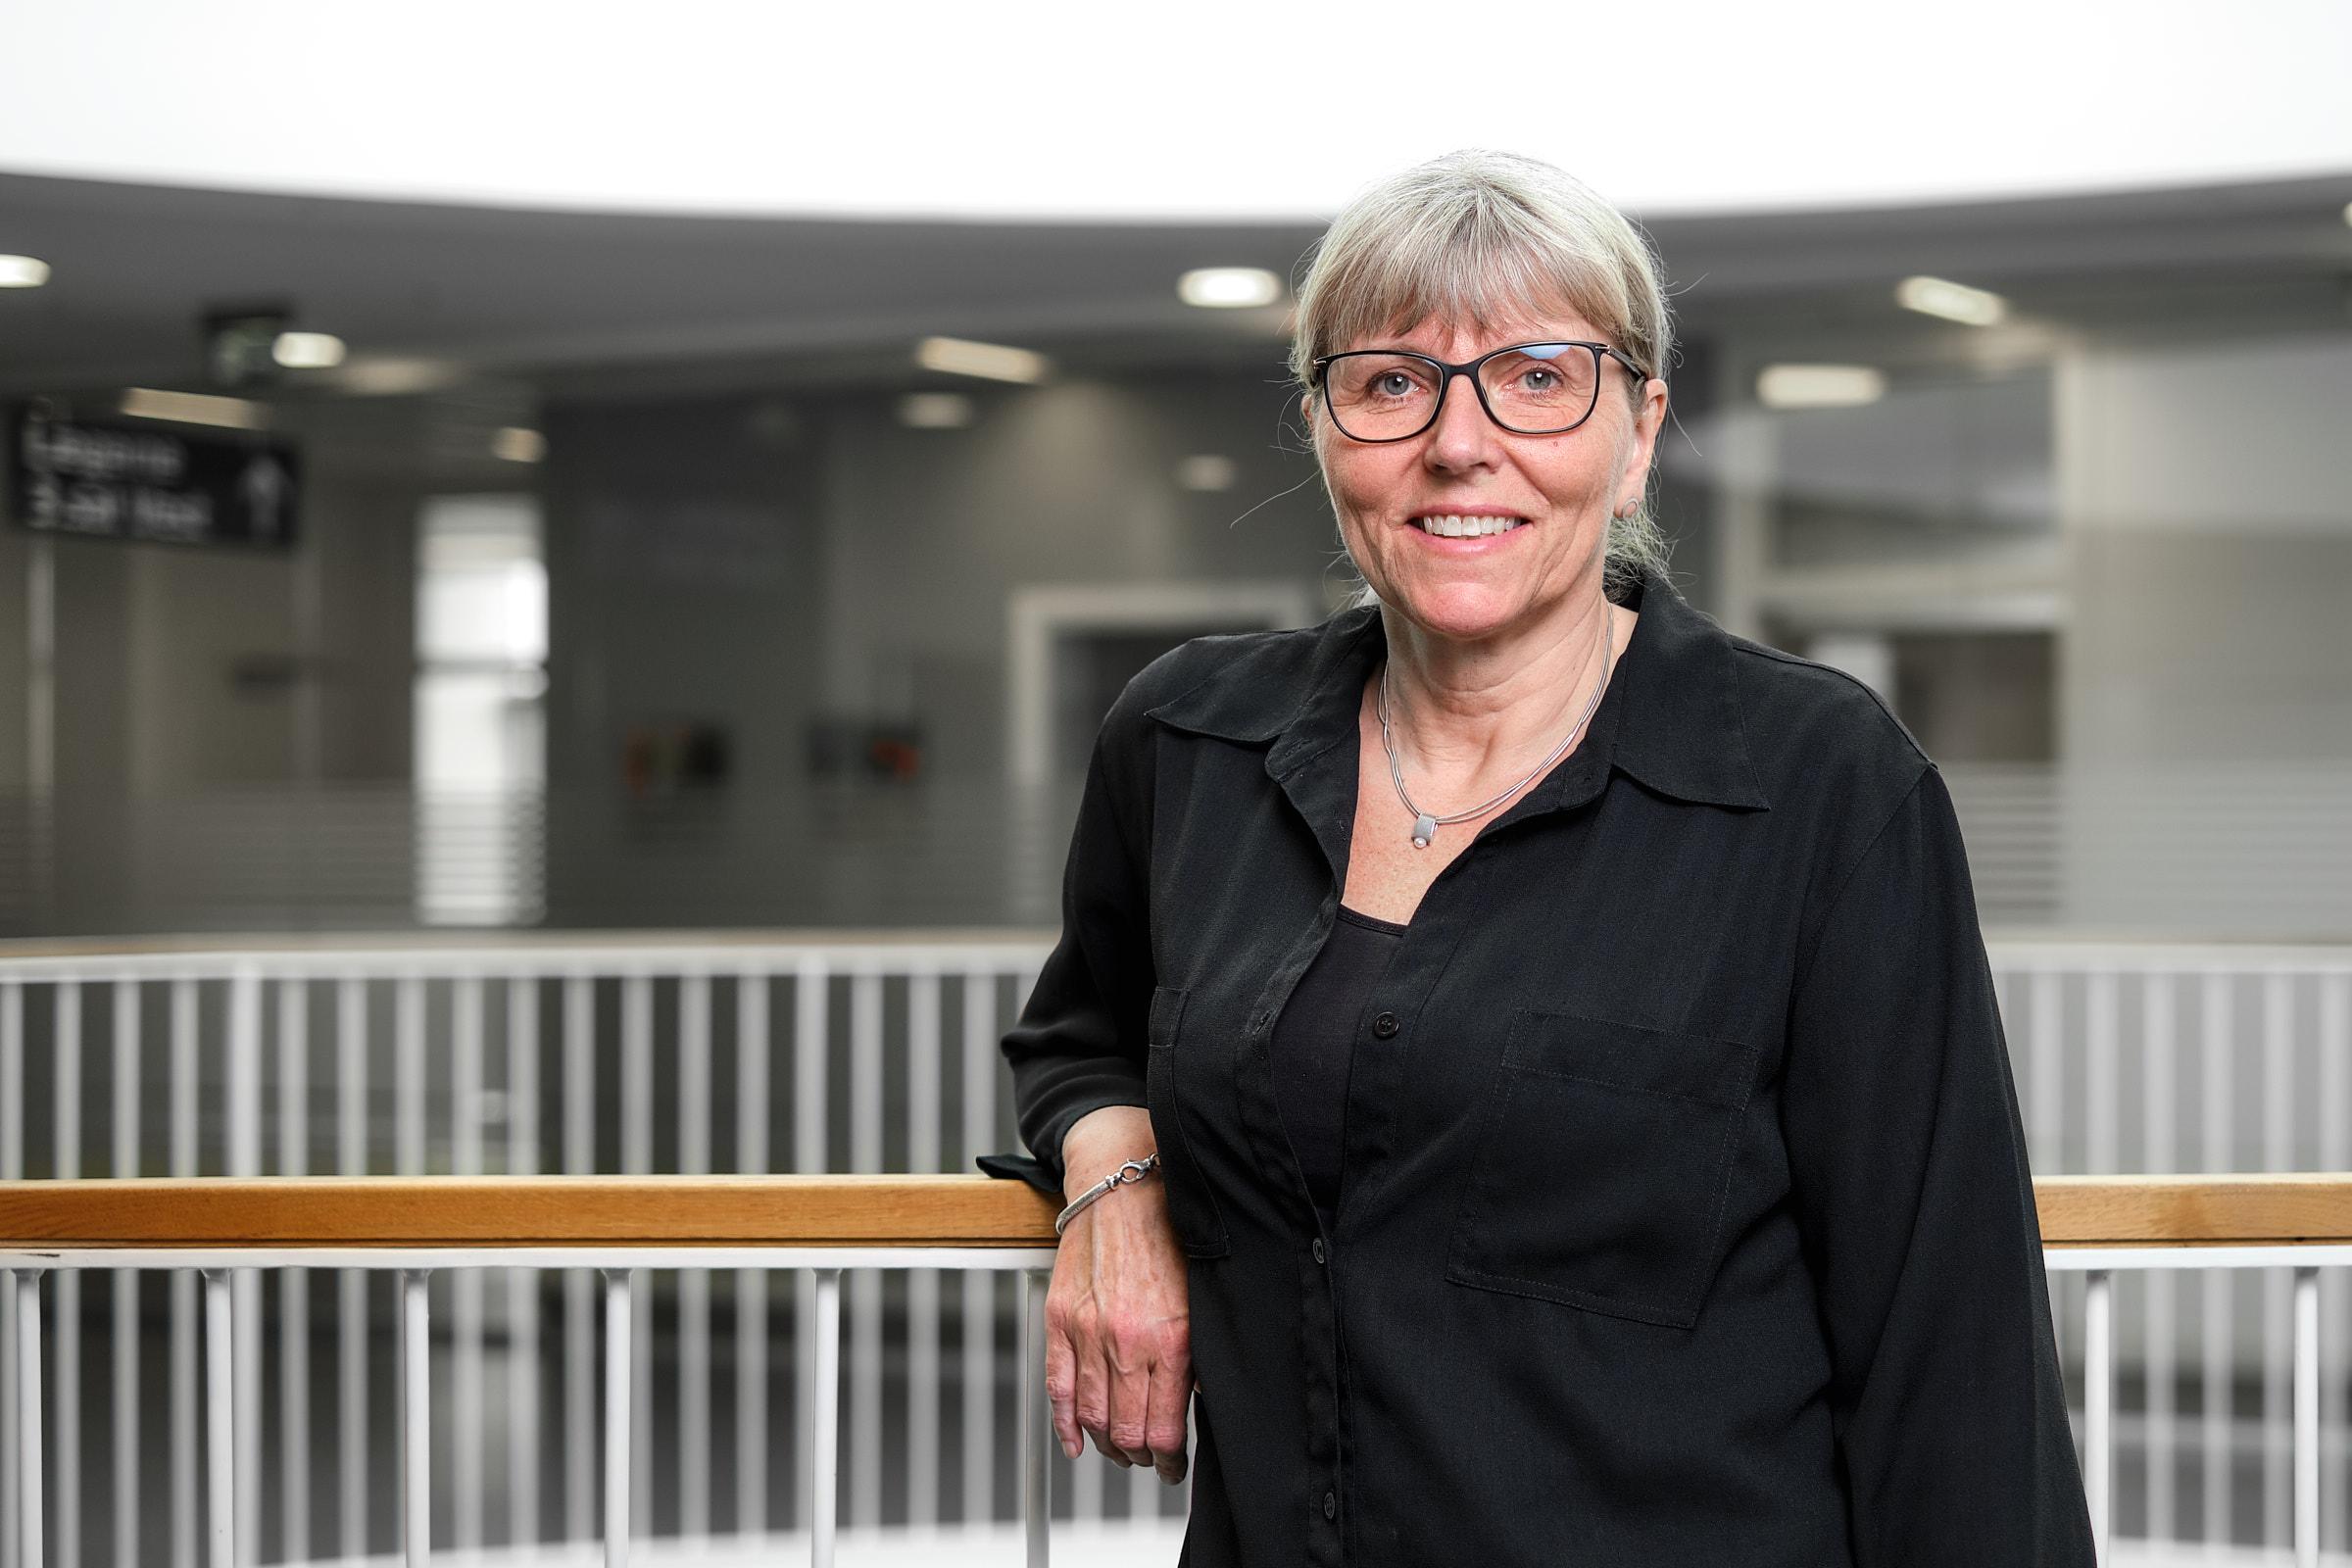 Maj-Britt Kristensen